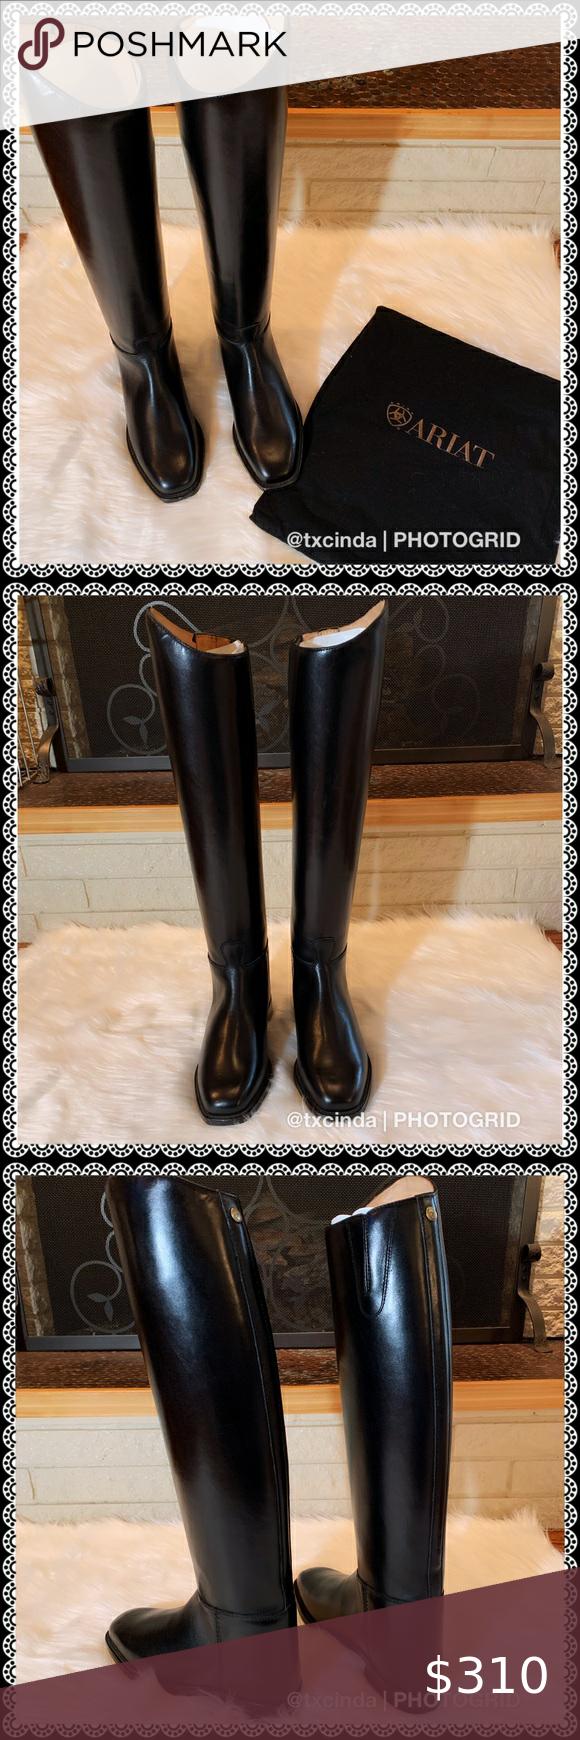 Ariat Maestro Pro Dress Tall Slim Riding Boots Brand New Ariat Maestro Pro Dress Tall Slim Calf Riding Boots English Tall Riding Boots Ariat Riding Boots Ariat [ 1740 x 580 Pixel ]